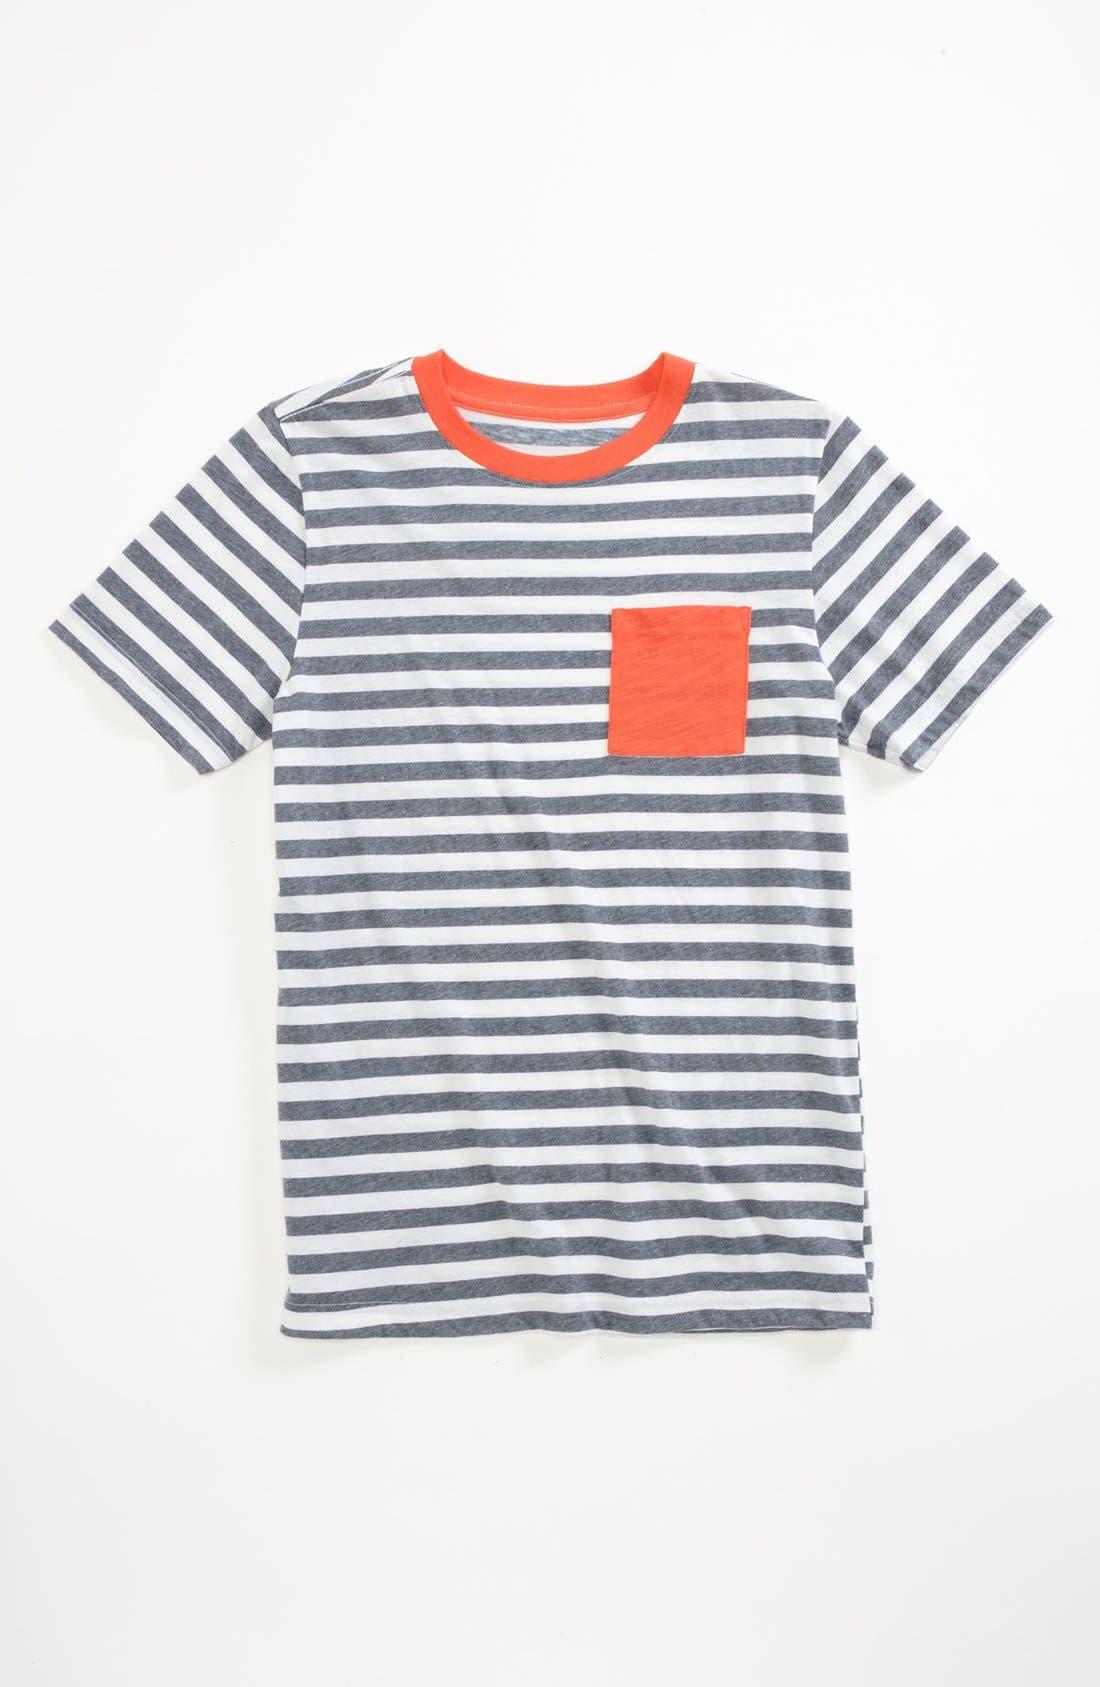 Main Image - Tucker + Tate 'Northlake' T-Shirt (Little Boys)